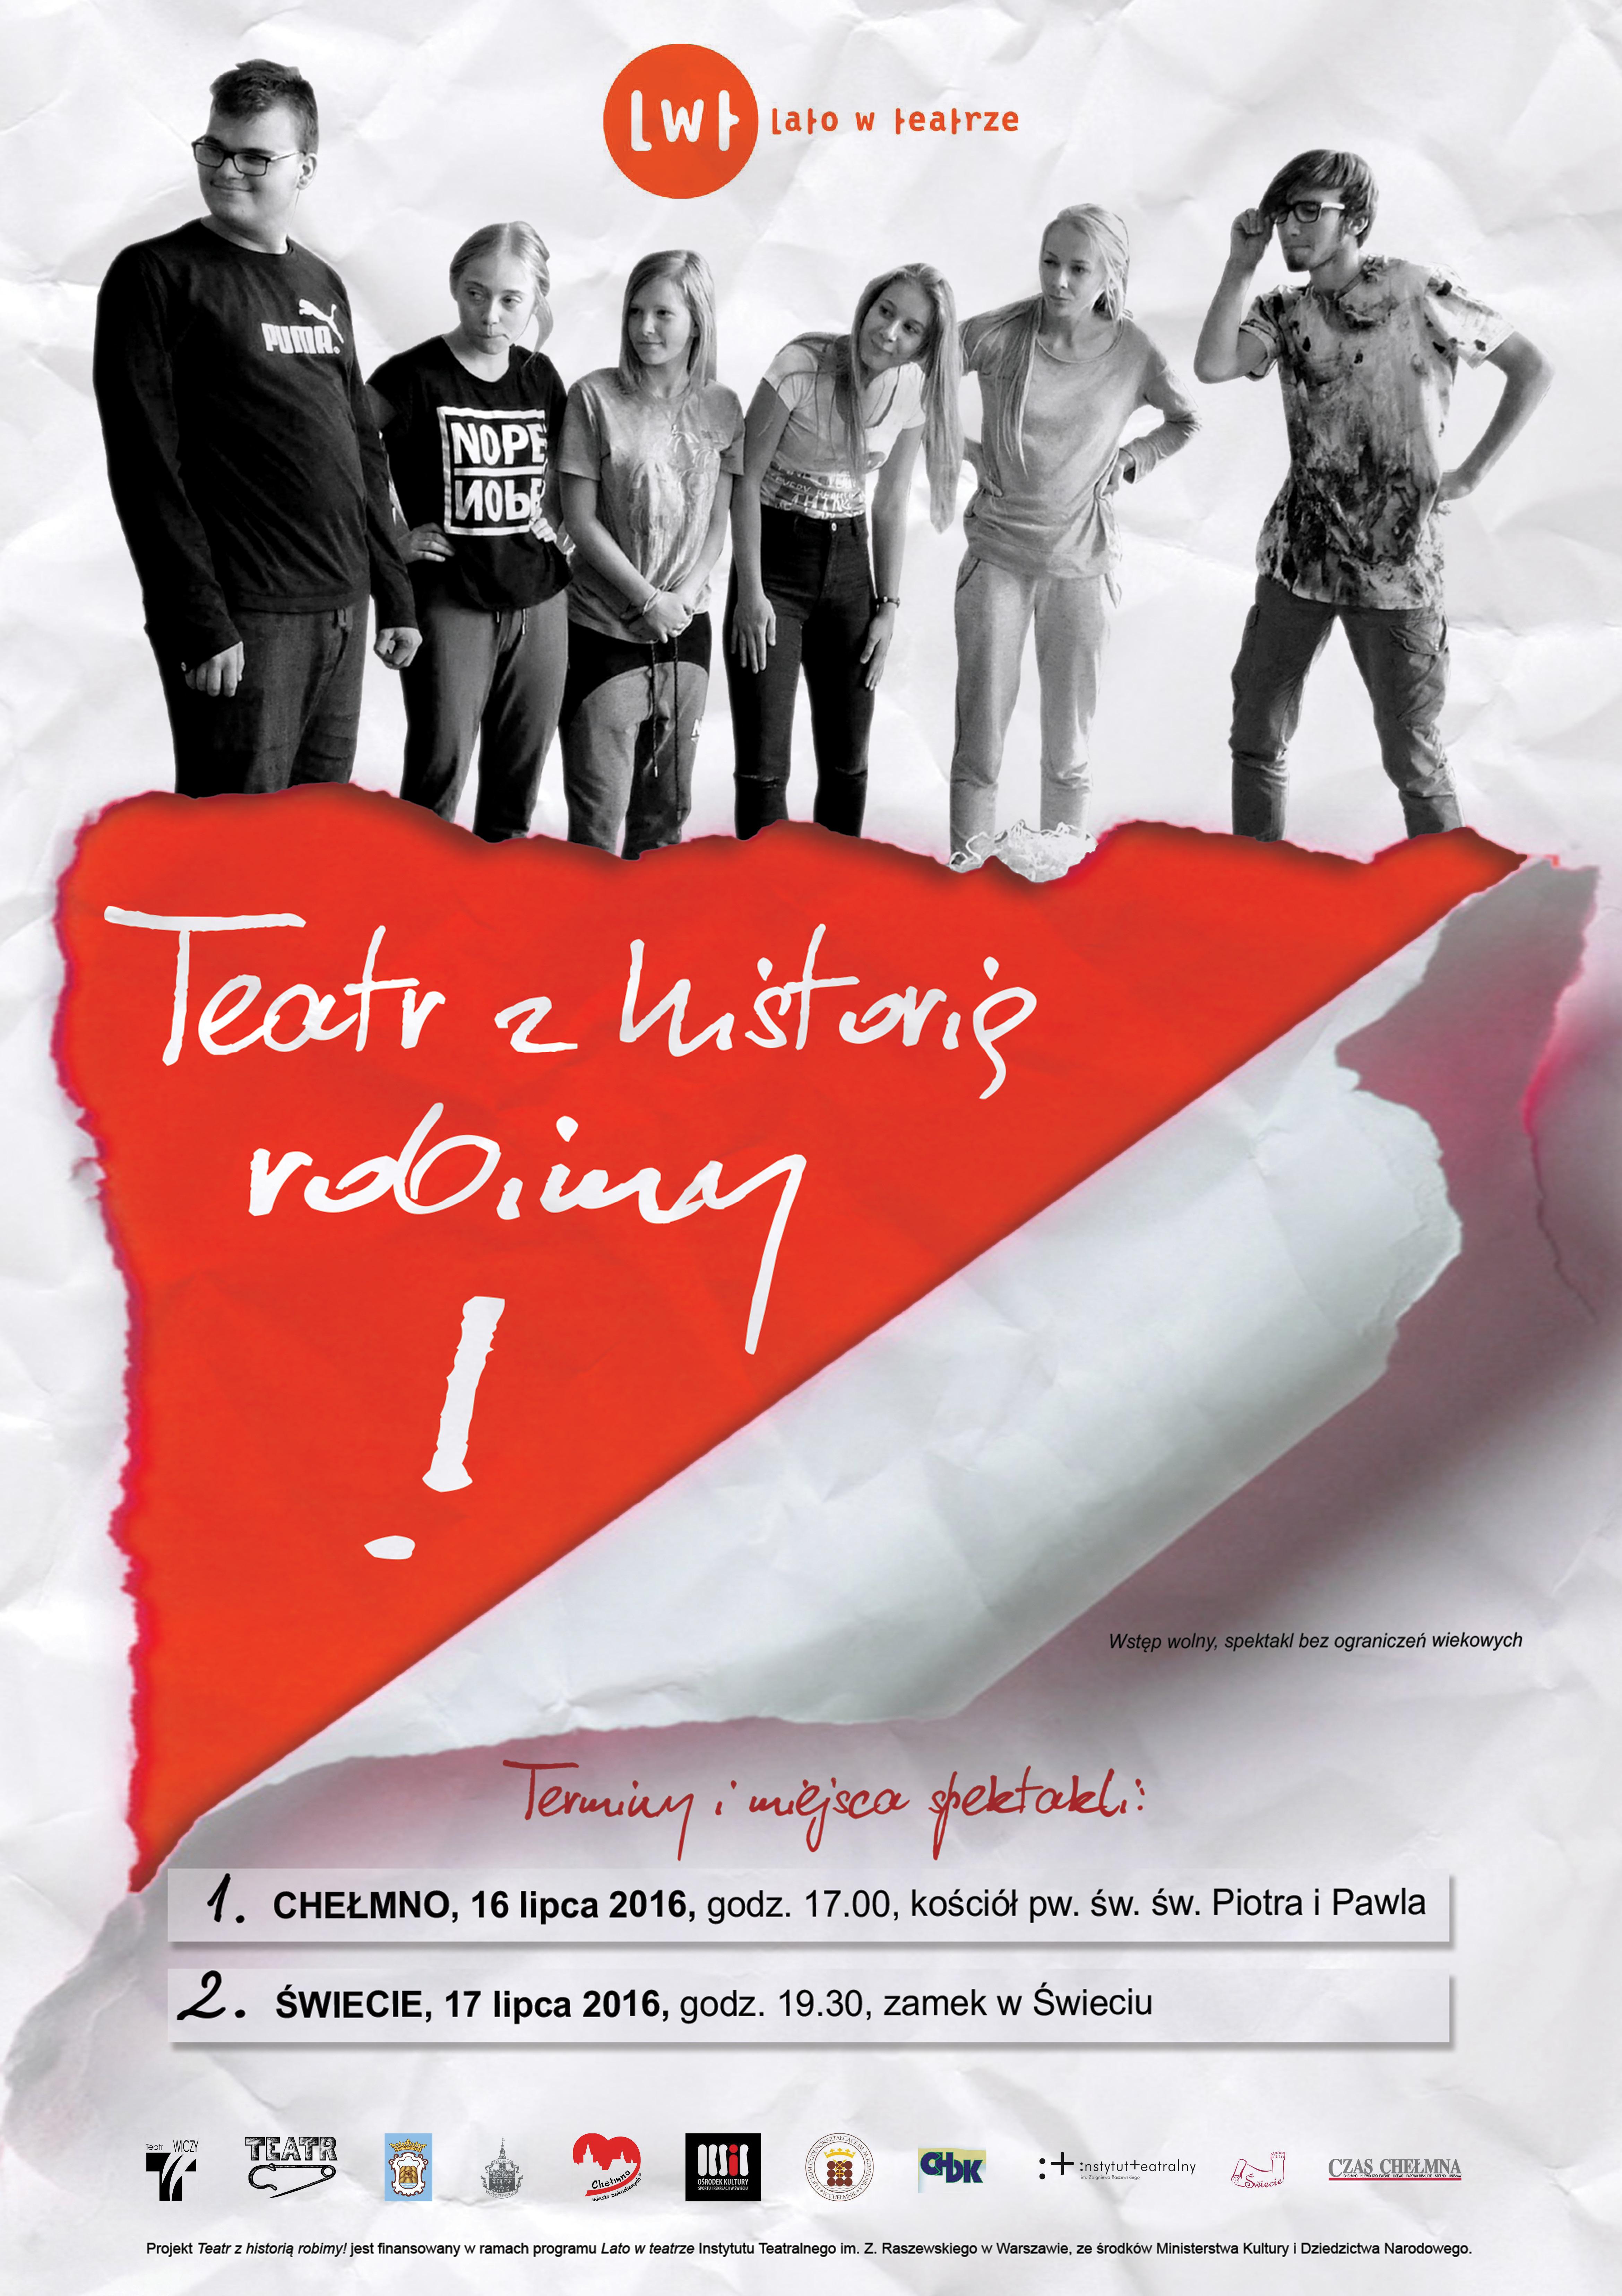 lato-w-teatrze-plakat-chelmno-2016